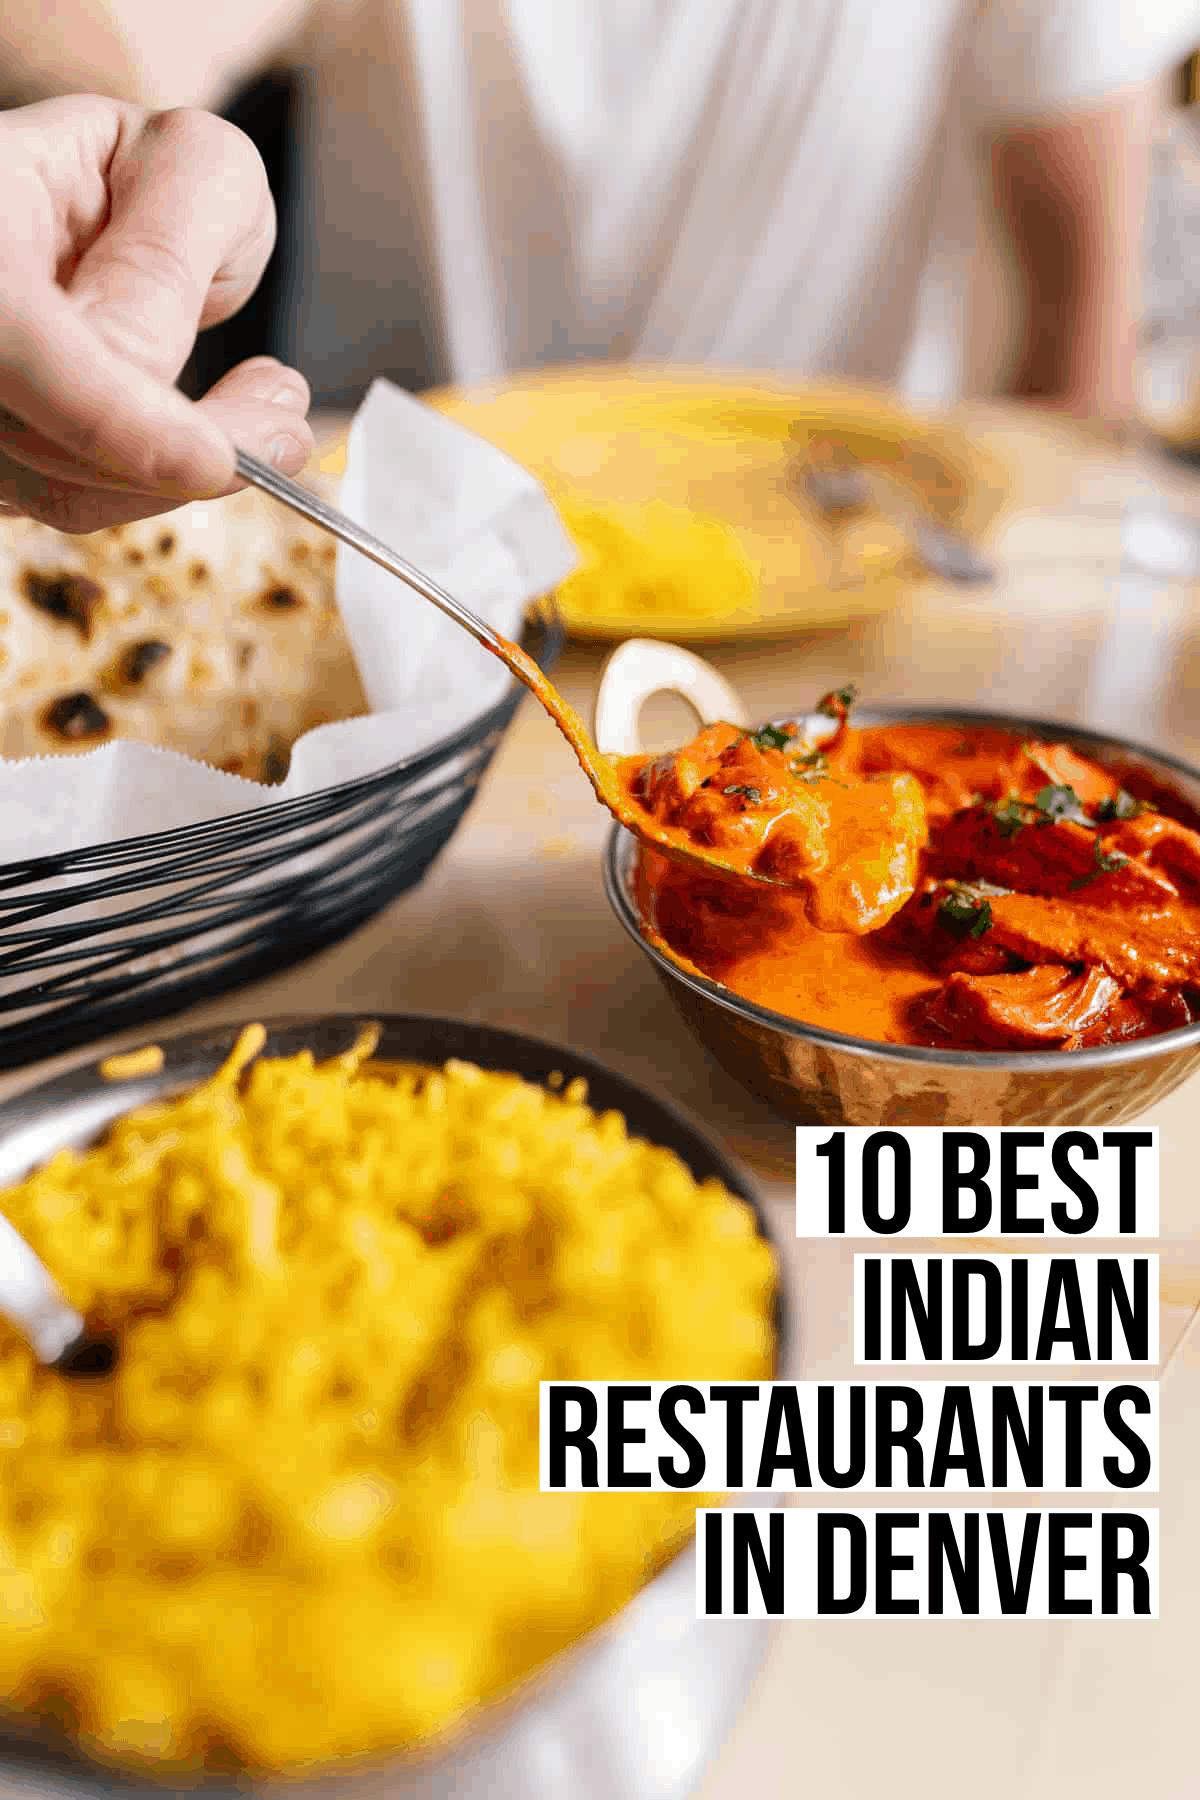 10 Best Indian Restaurants in Denver